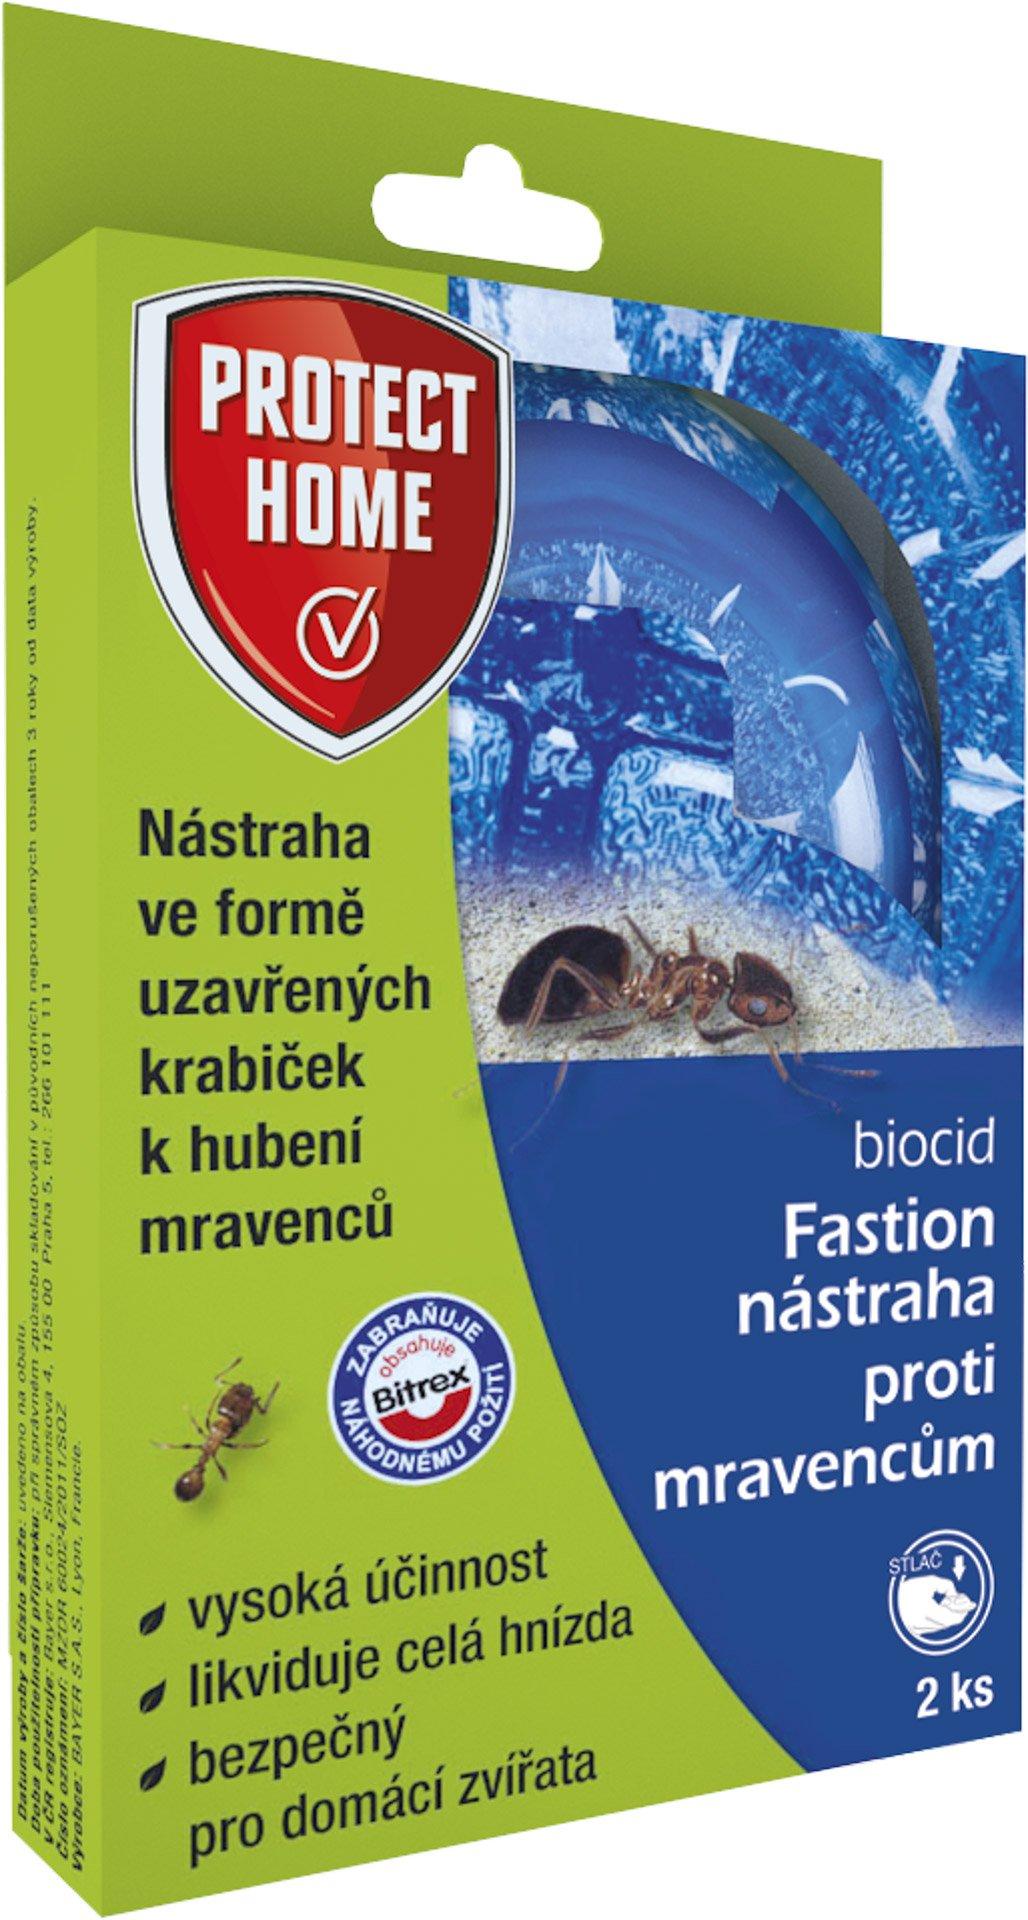 Nástraha Fastion na mravence (2ks) PH